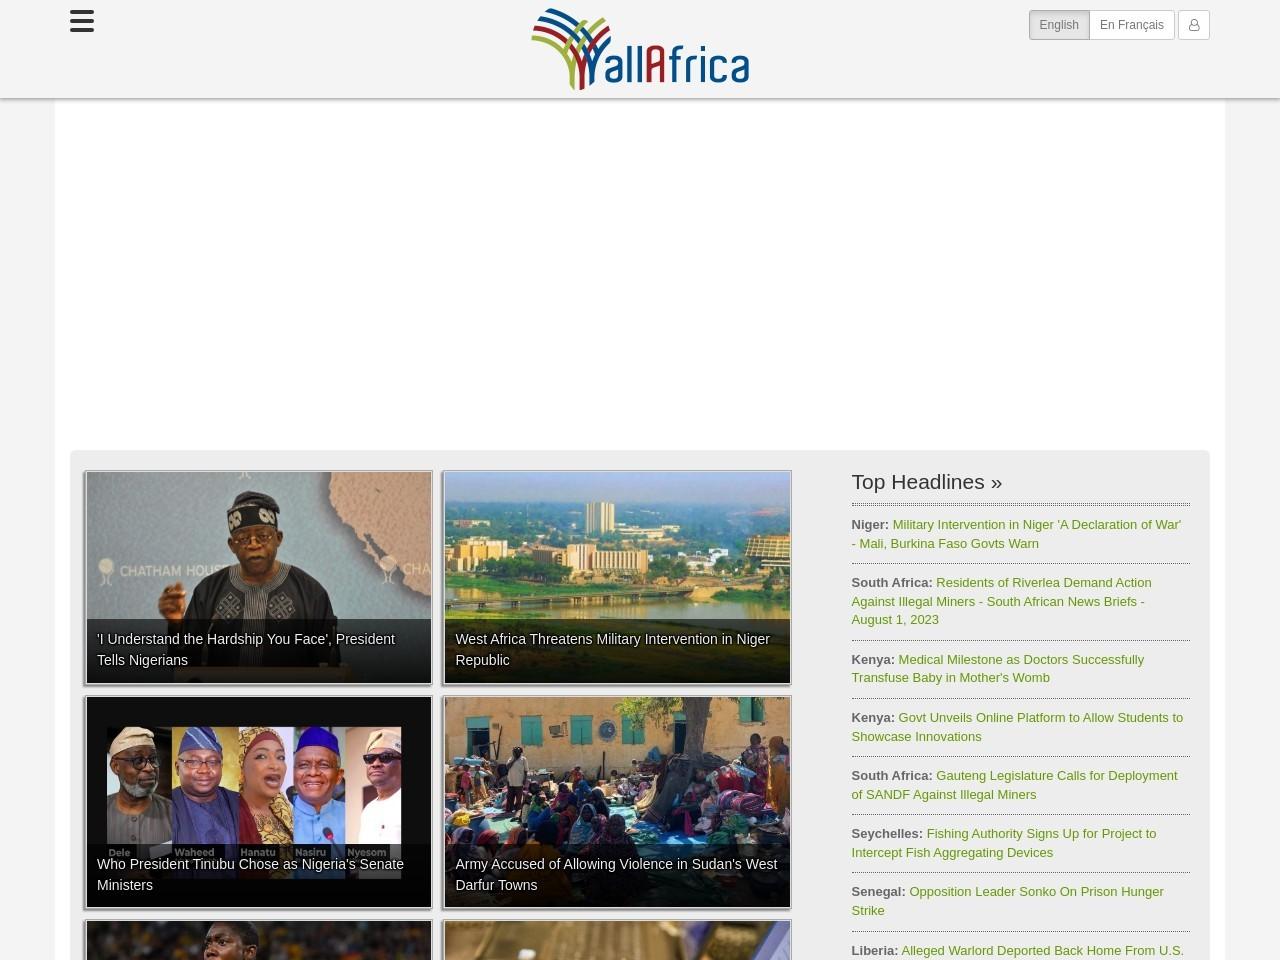 Angola: Ruling Party Regains Power but Faces Legitimacy Questions